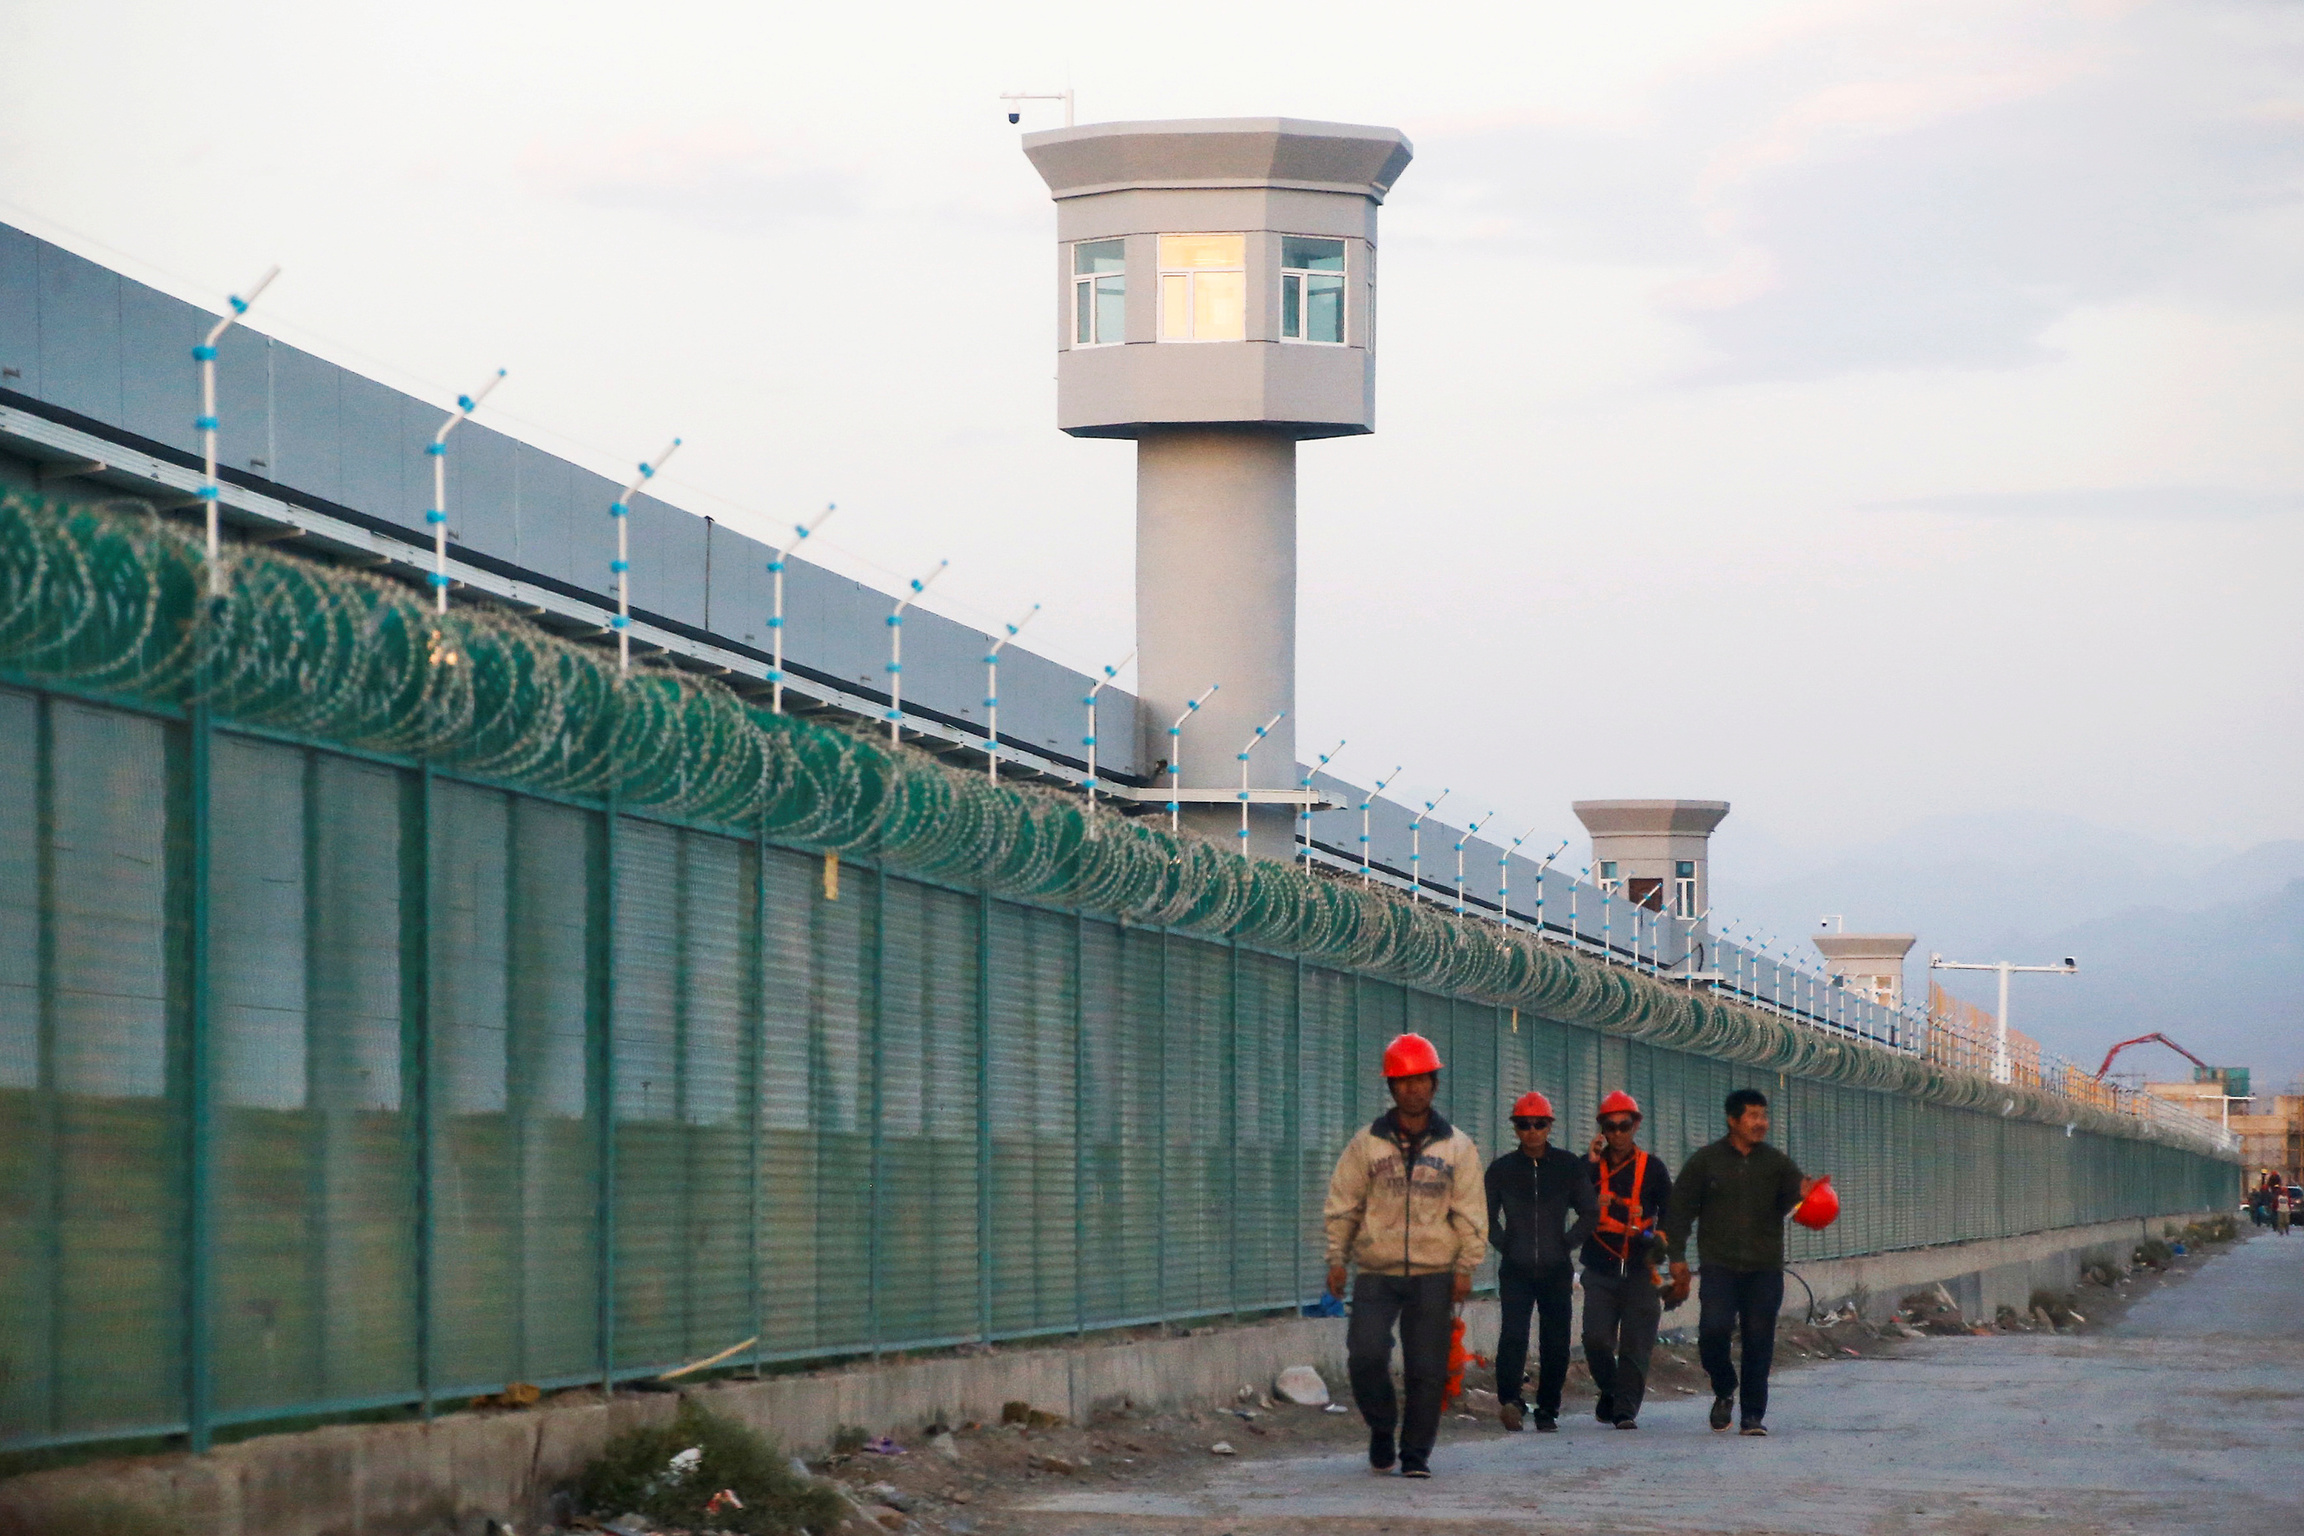 Four workers in uniform walk near a long, green fence.